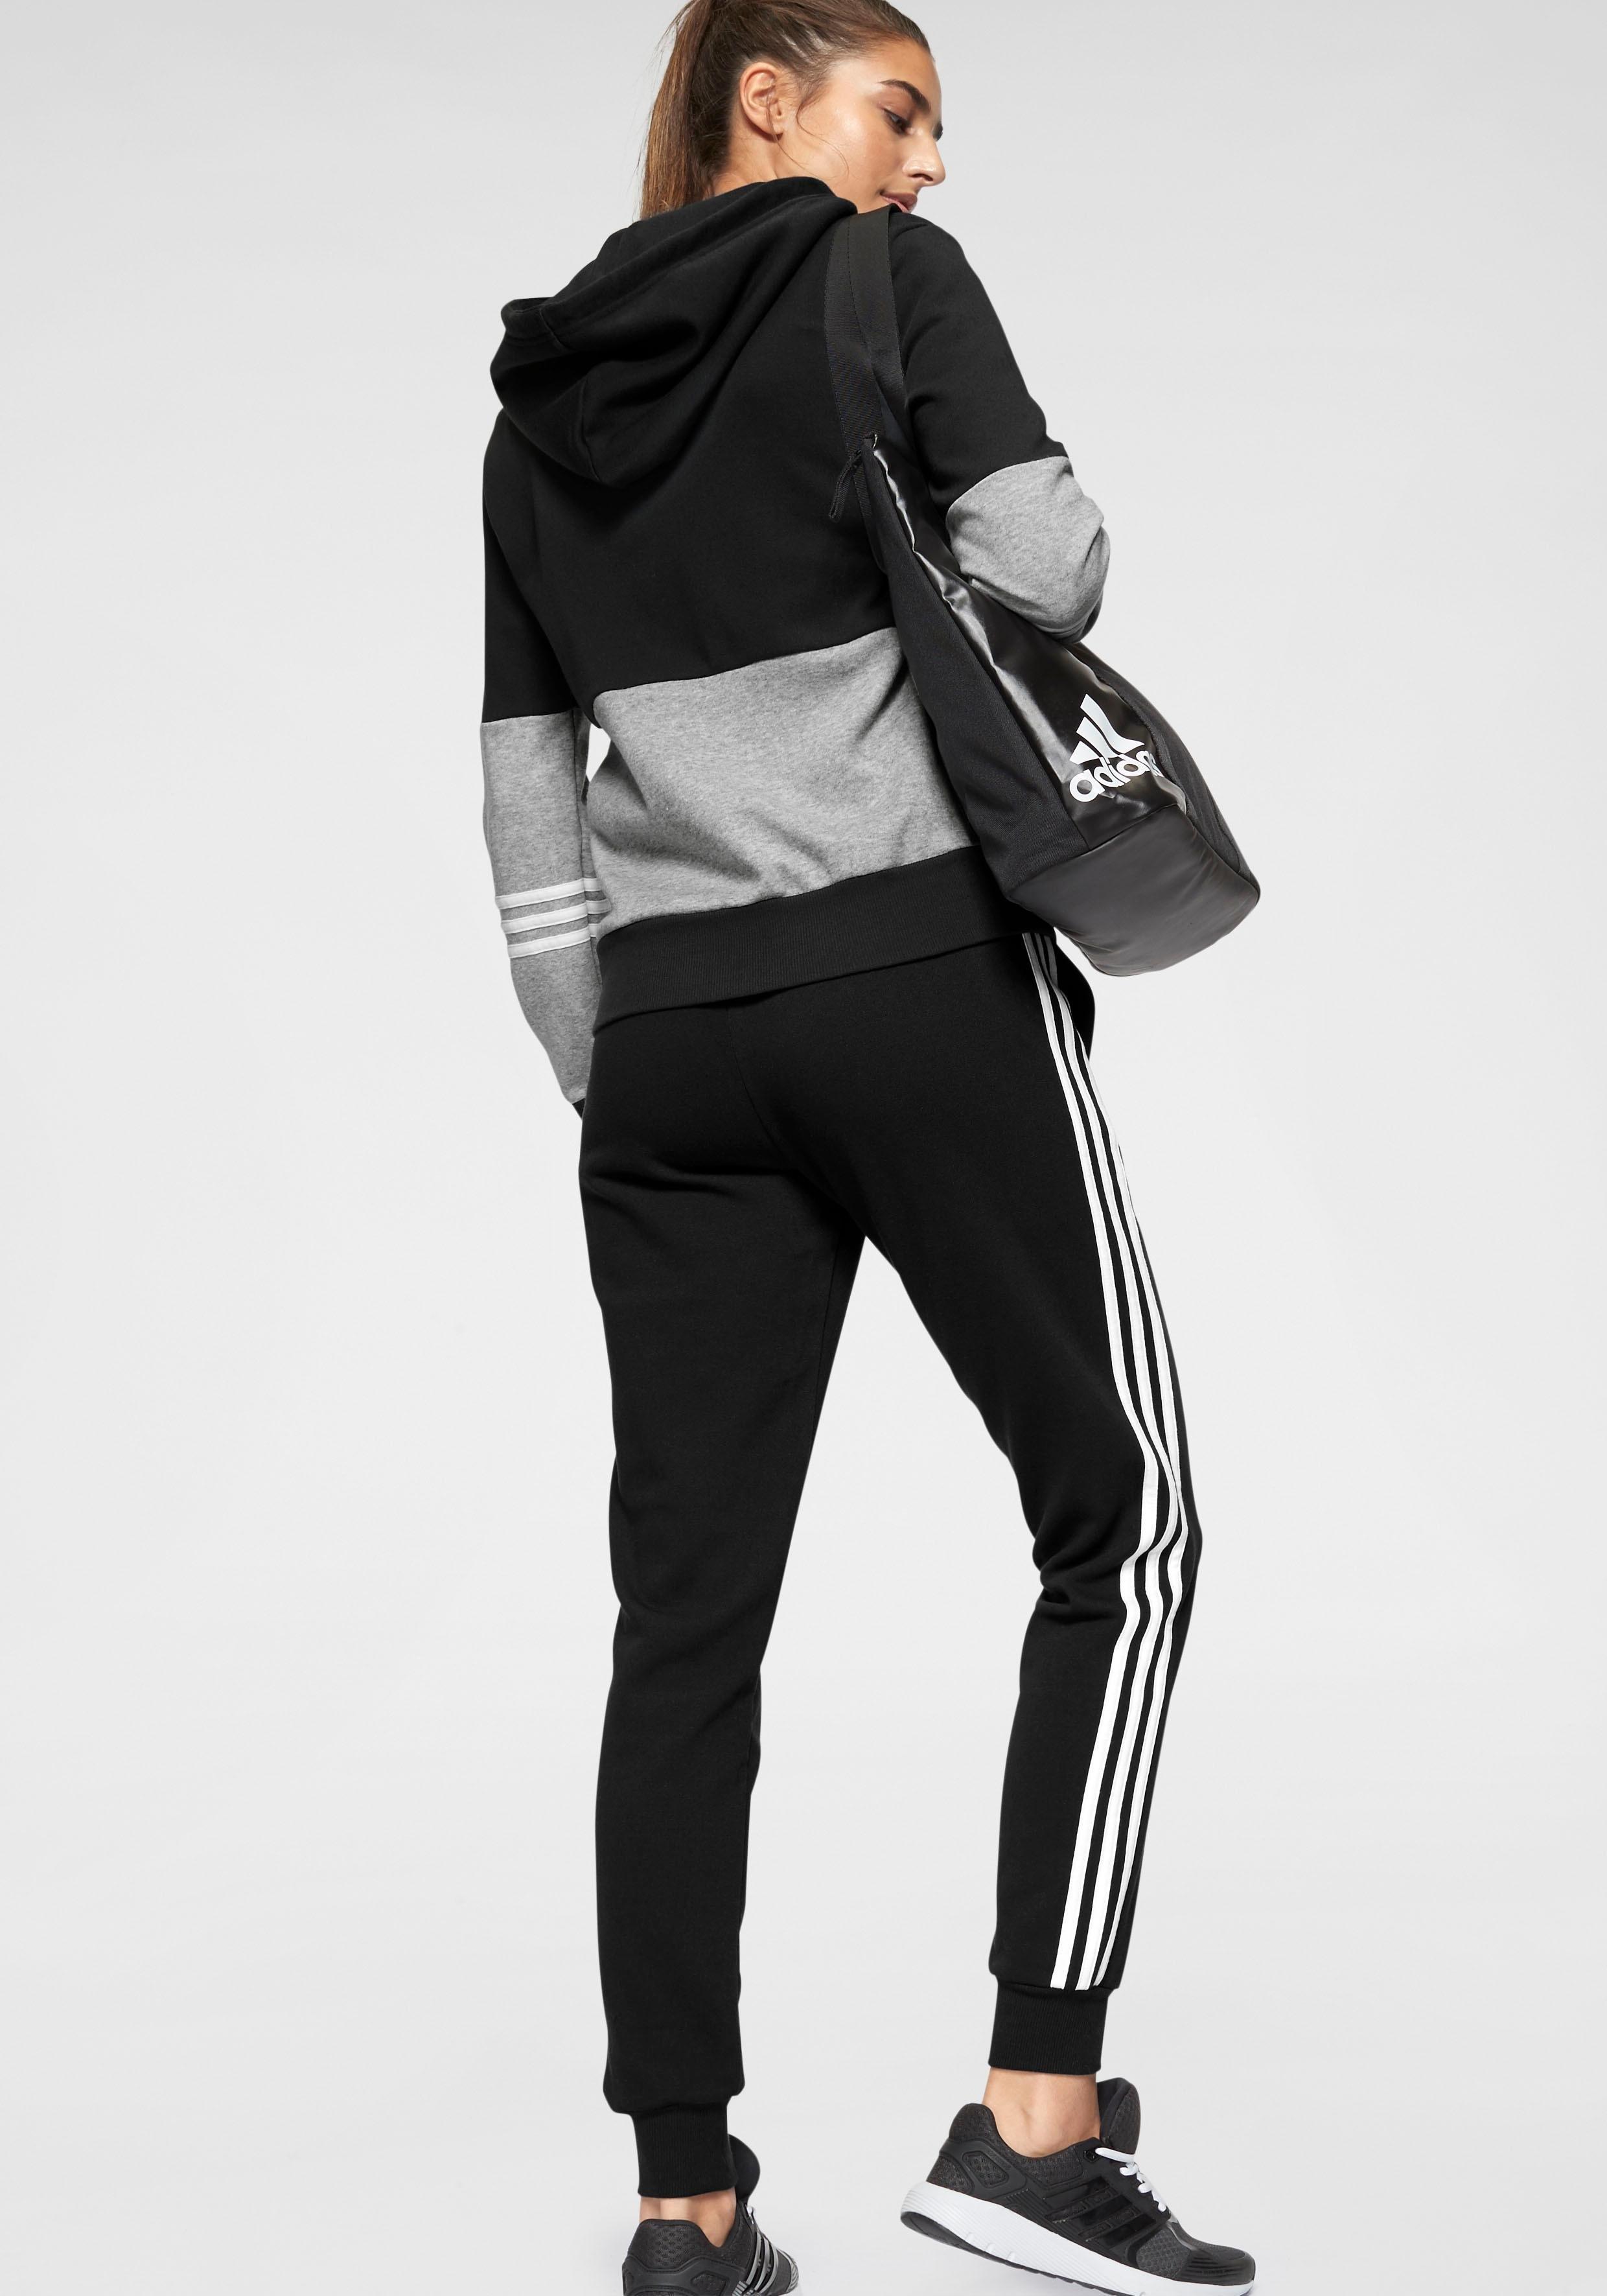 Online Performance Bij Adidas Joggingpaktracksuit Cotton Energize bD9eEH2IYW